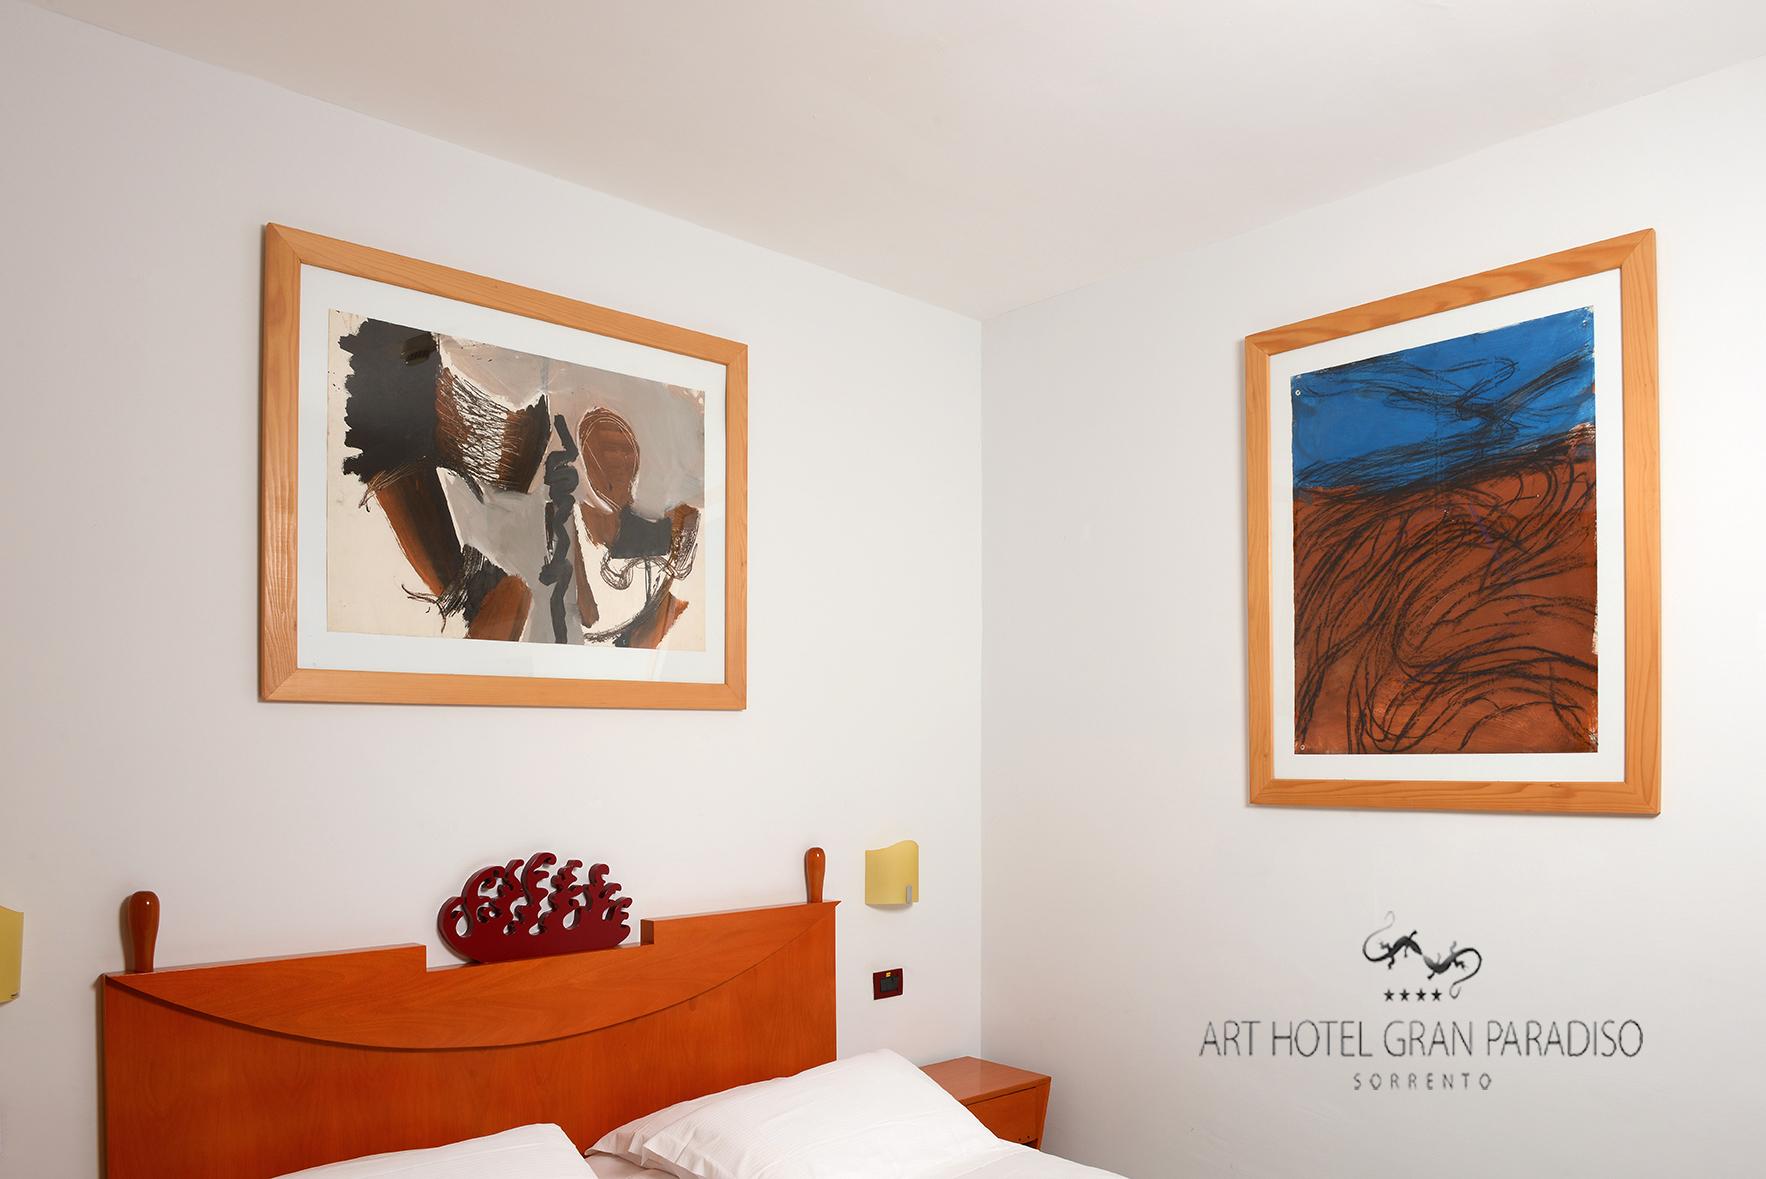 Art_Hotel_Gran_Paradiso_2013_314_Nanni_Valentini_1.jpg